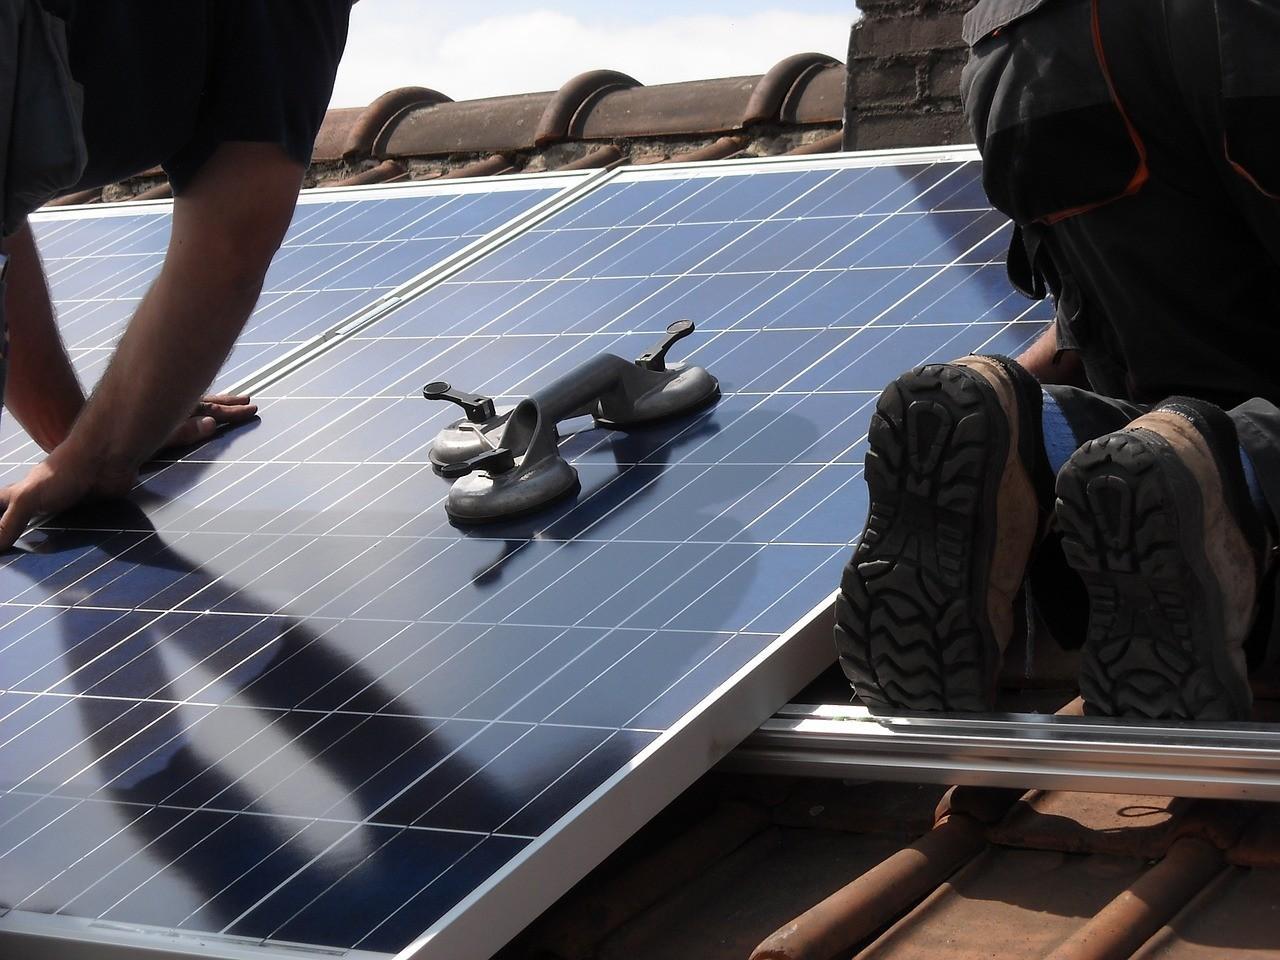 solar-panels-944002_1280.jpg